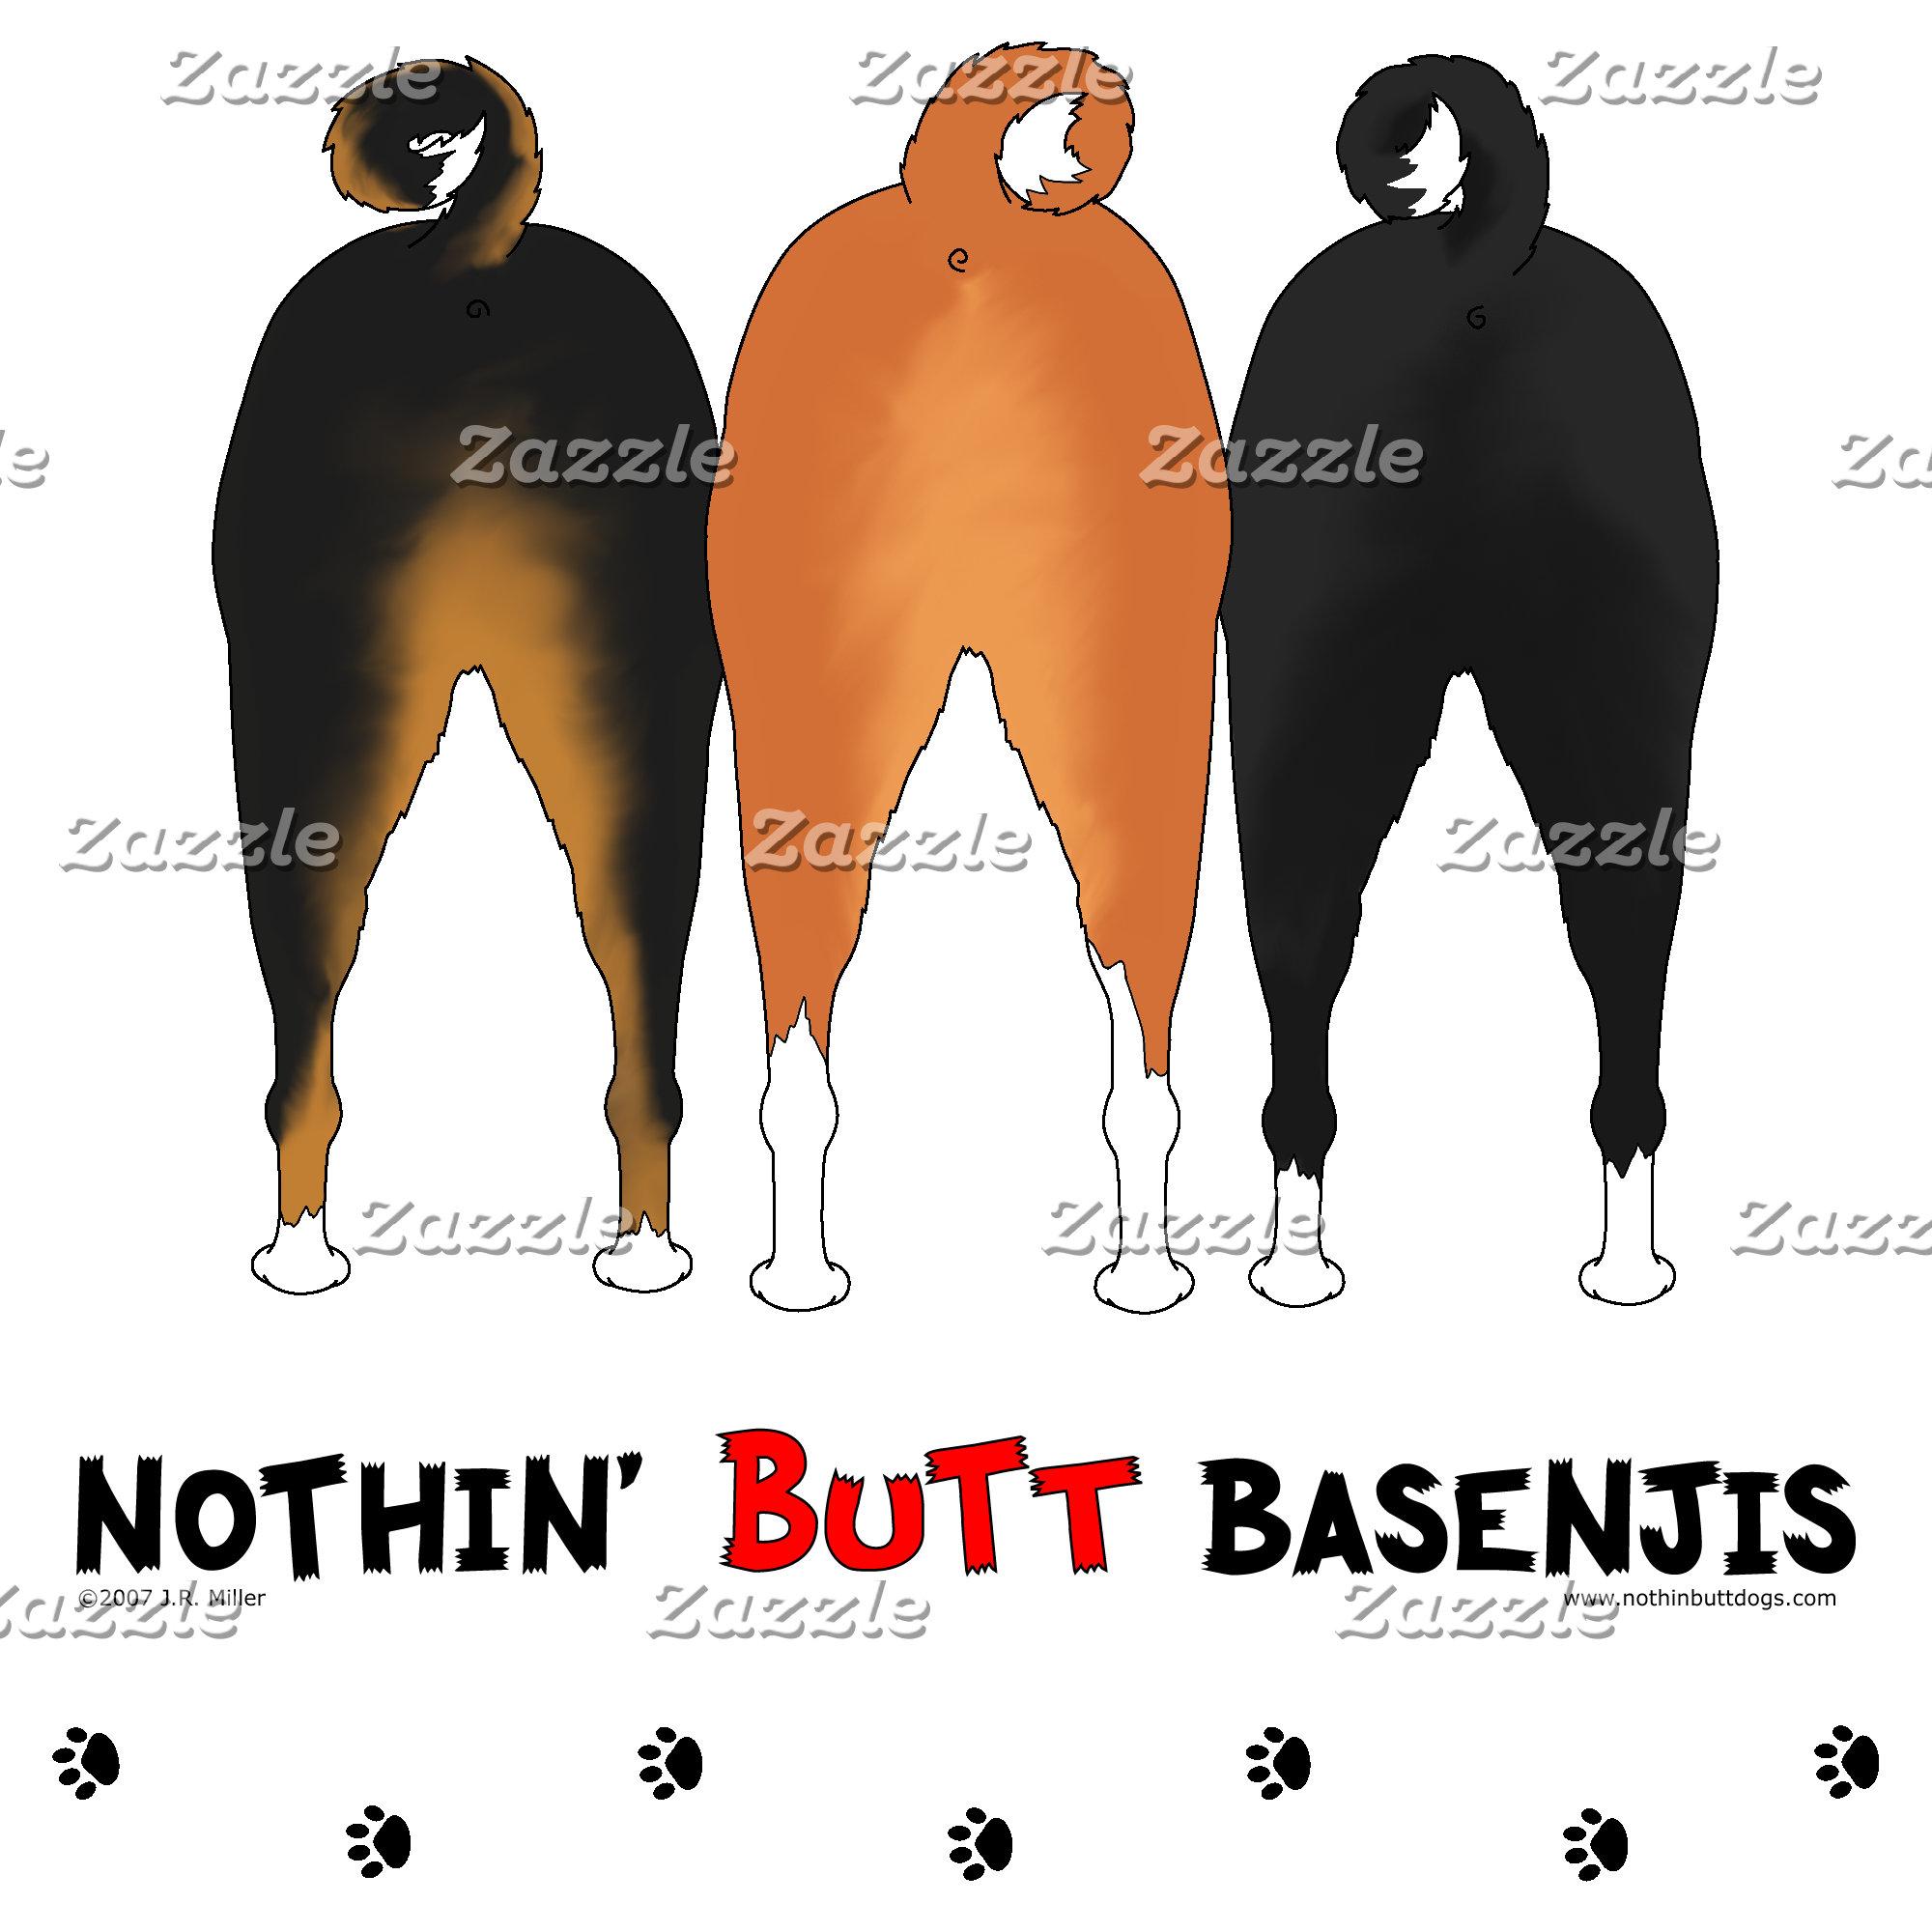 Basenjis